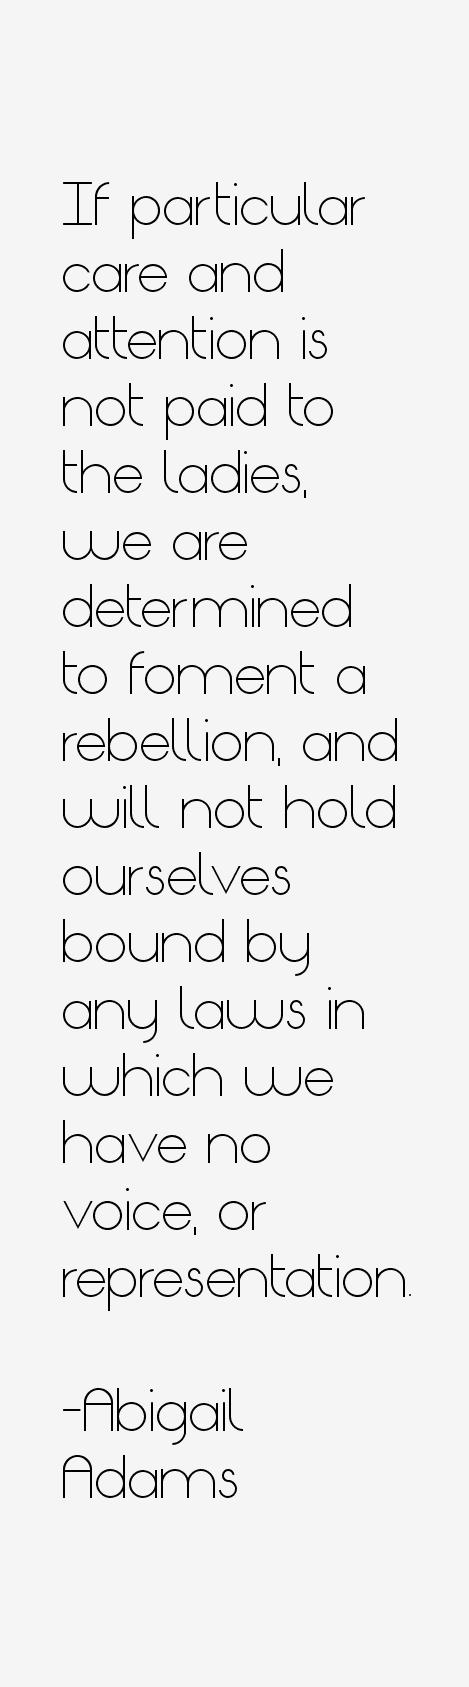 Abigail Adams Quotes Abigail Adams Quotes & Sayings